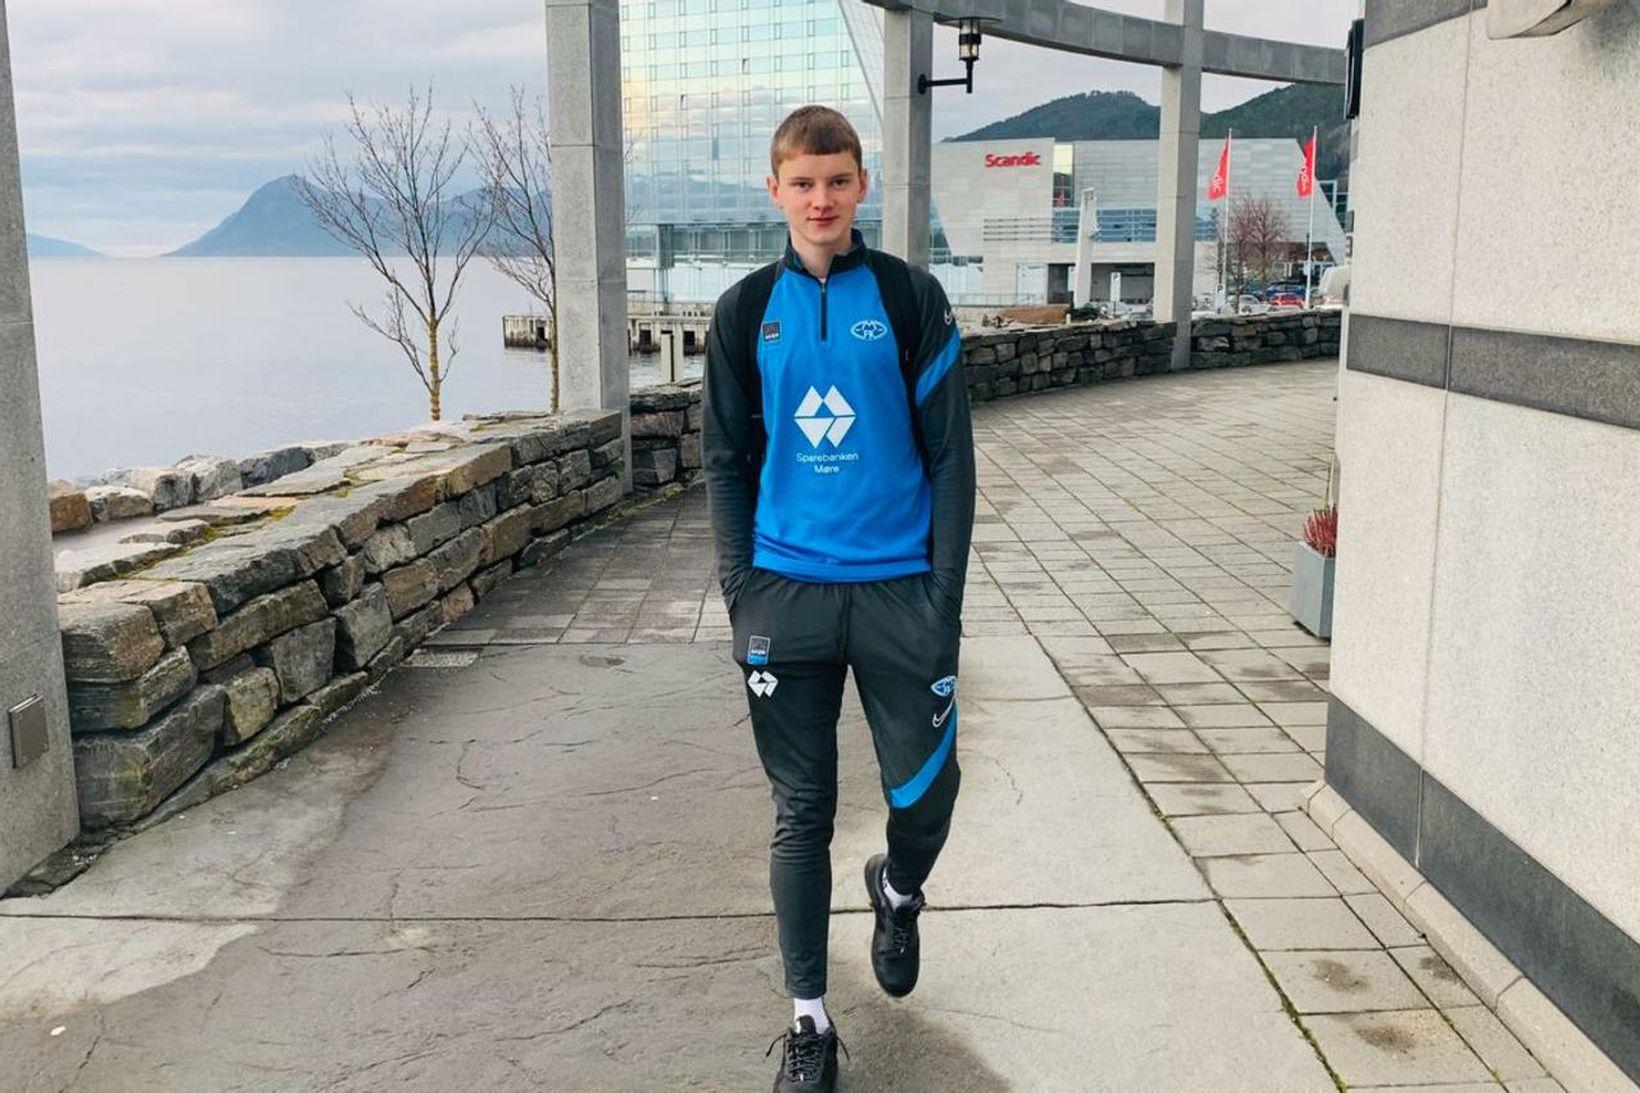 Birkir Jakob Jónsson